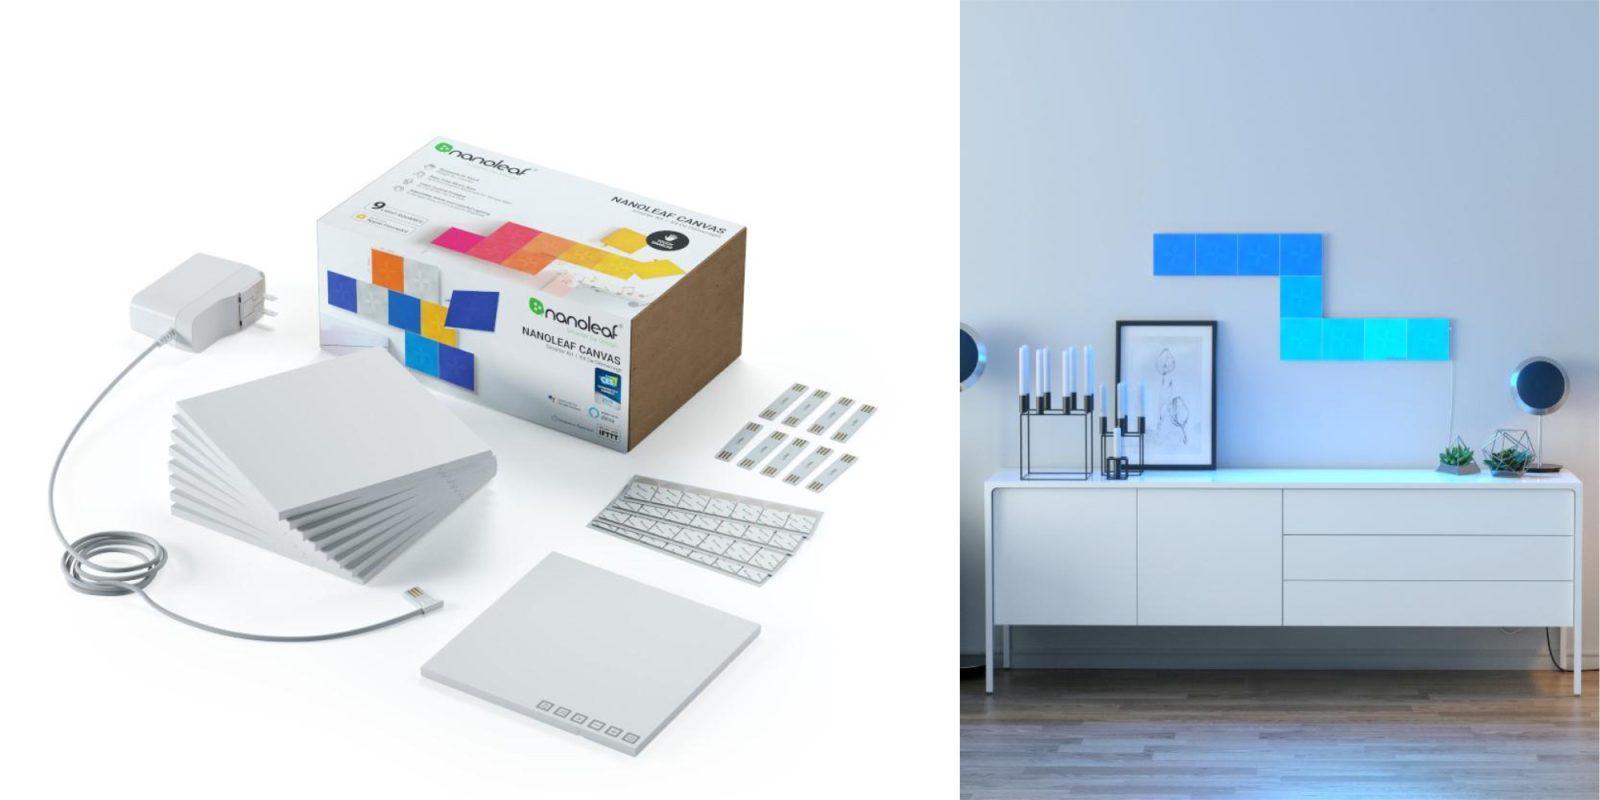 Nanoleaf HomeKit Canvas Smarter Kit drops to lowest price at $200, Rhythm Kit $180, more